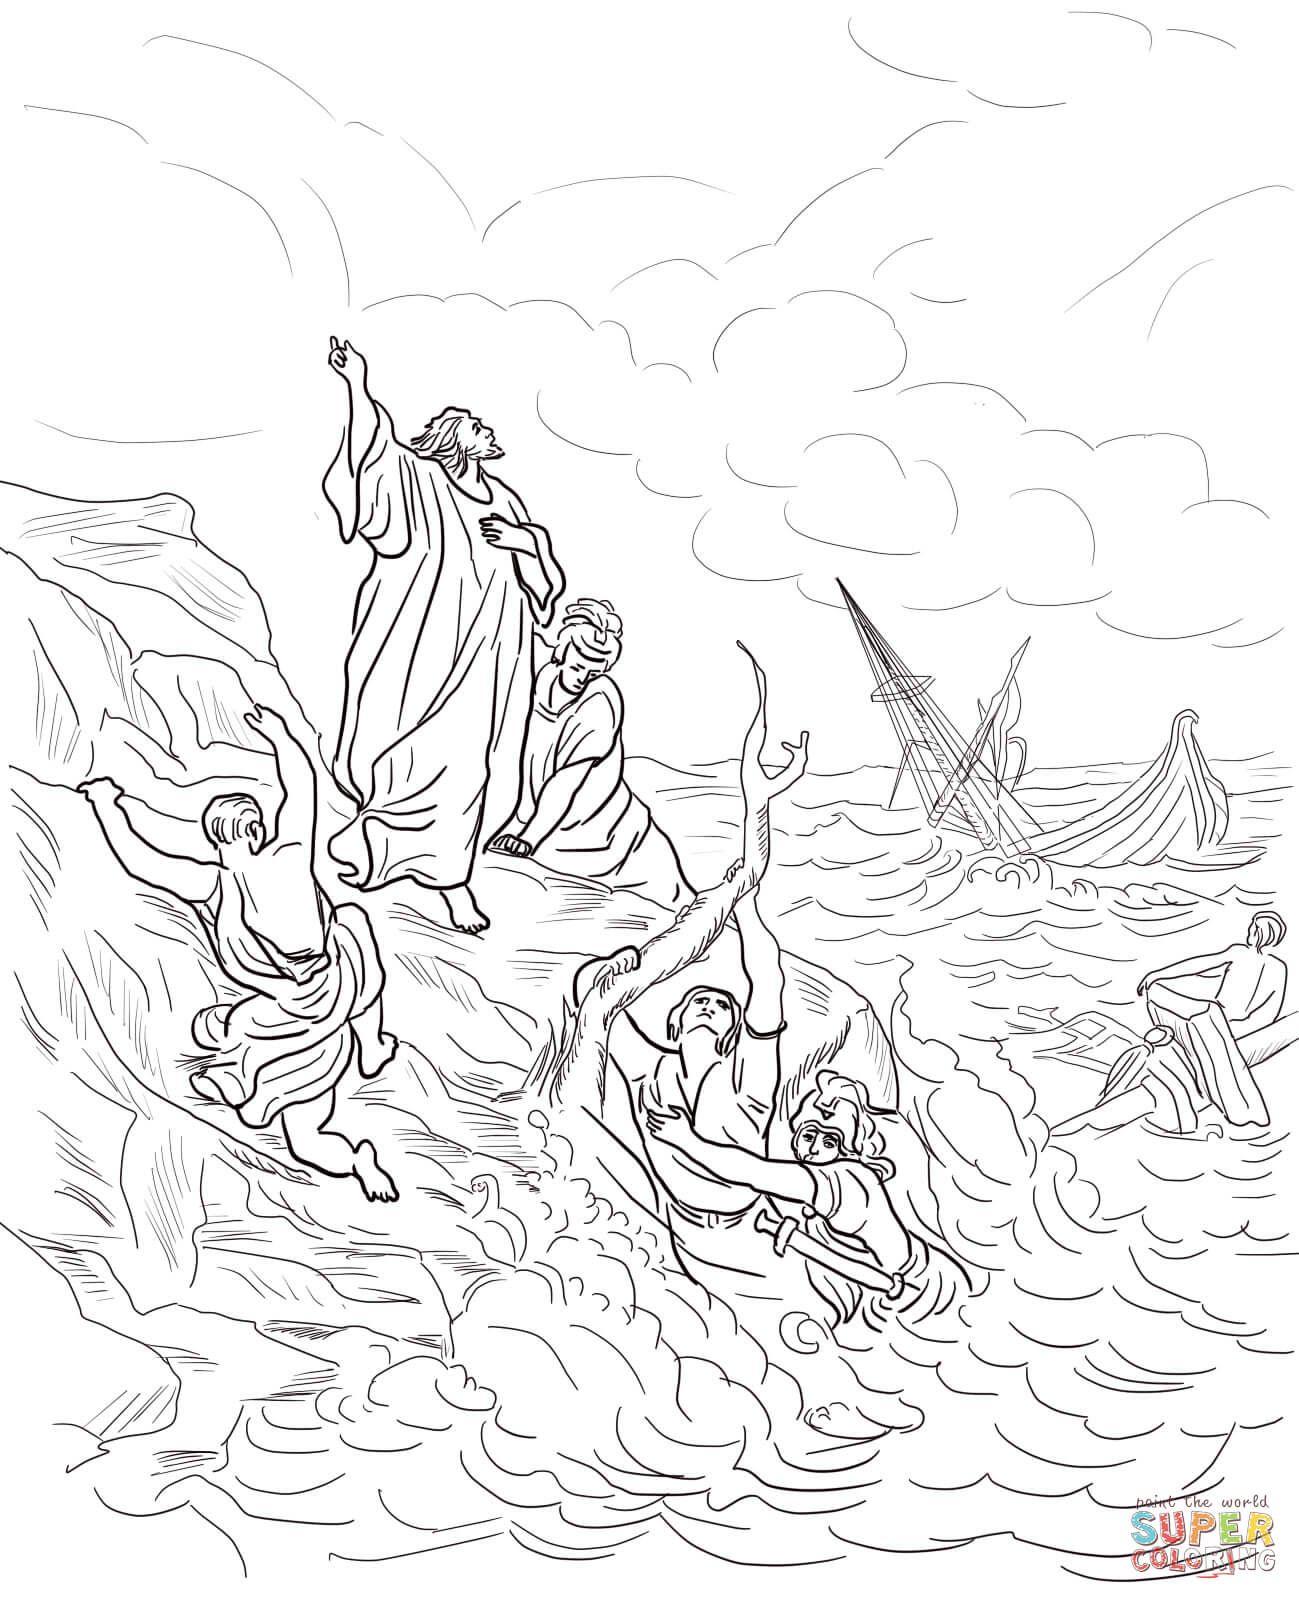 Apostle Paul Shipwrecked | Super Coloring | vasárnapi iskola | Pinterest